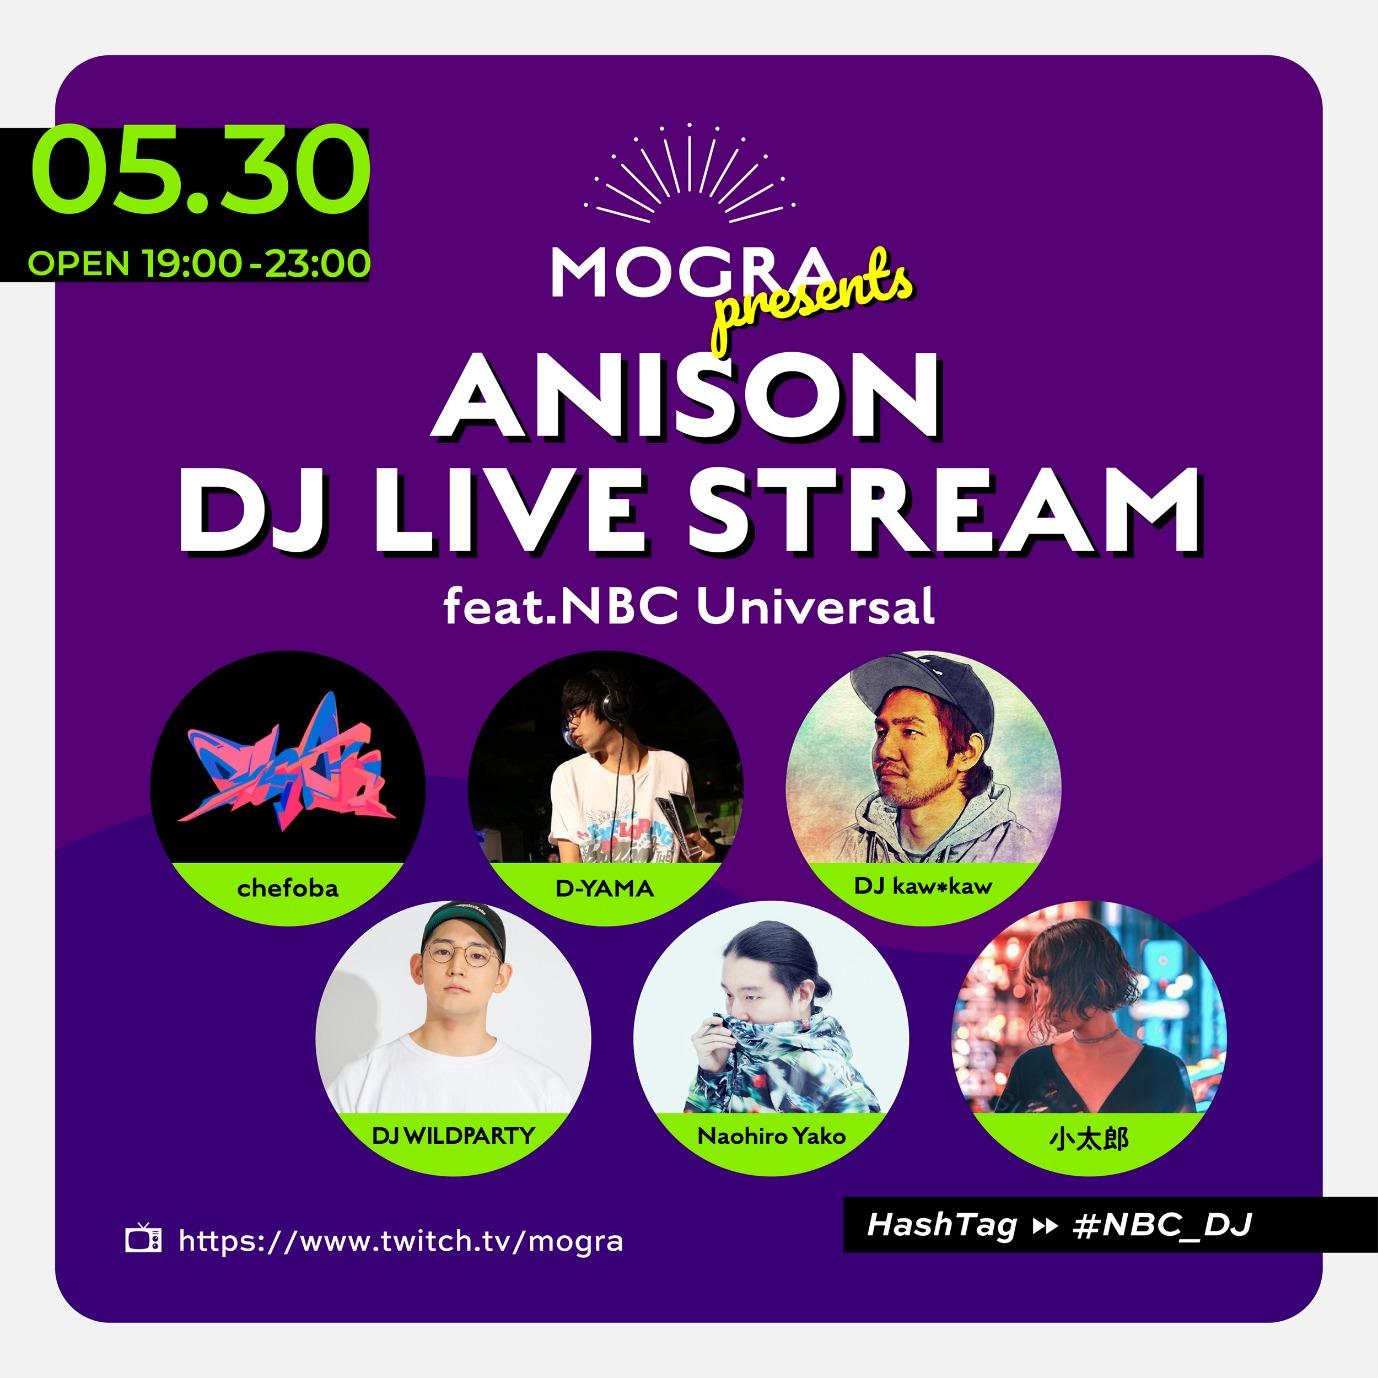 MOGRA presents ANISON DJ LIVE STREAM feat. NBC Universal